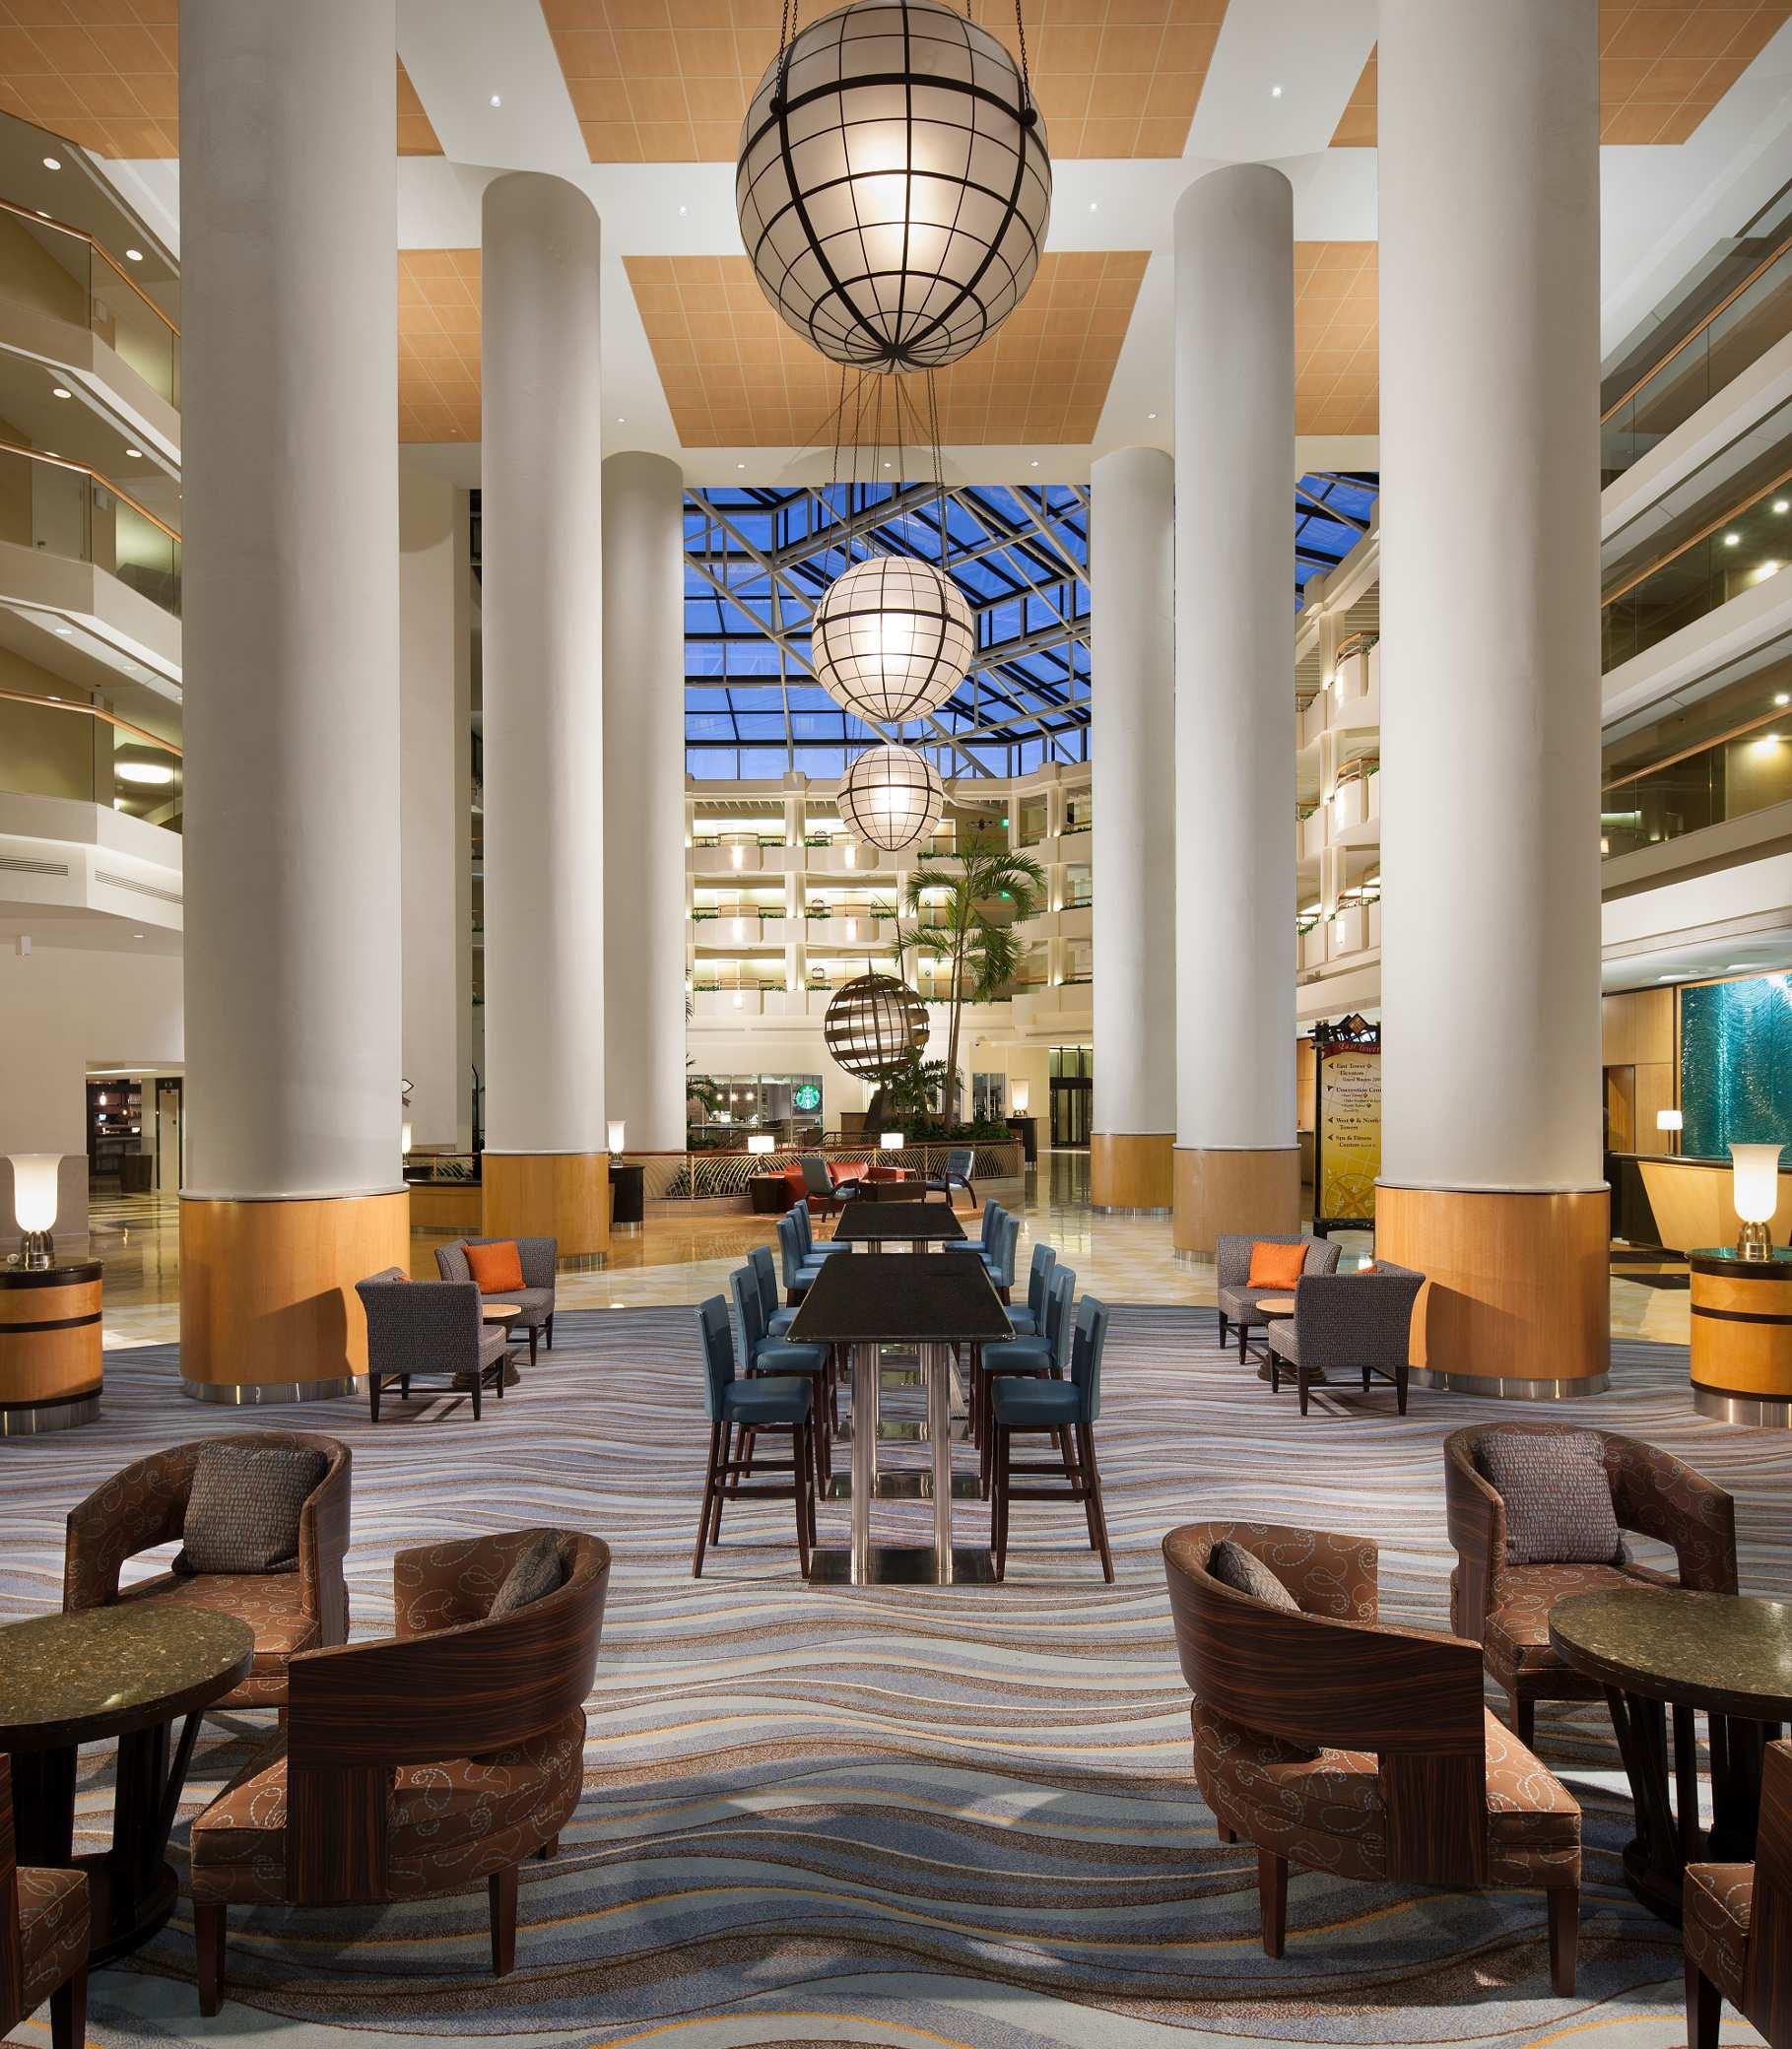 Orlando World Center Marriott image 21